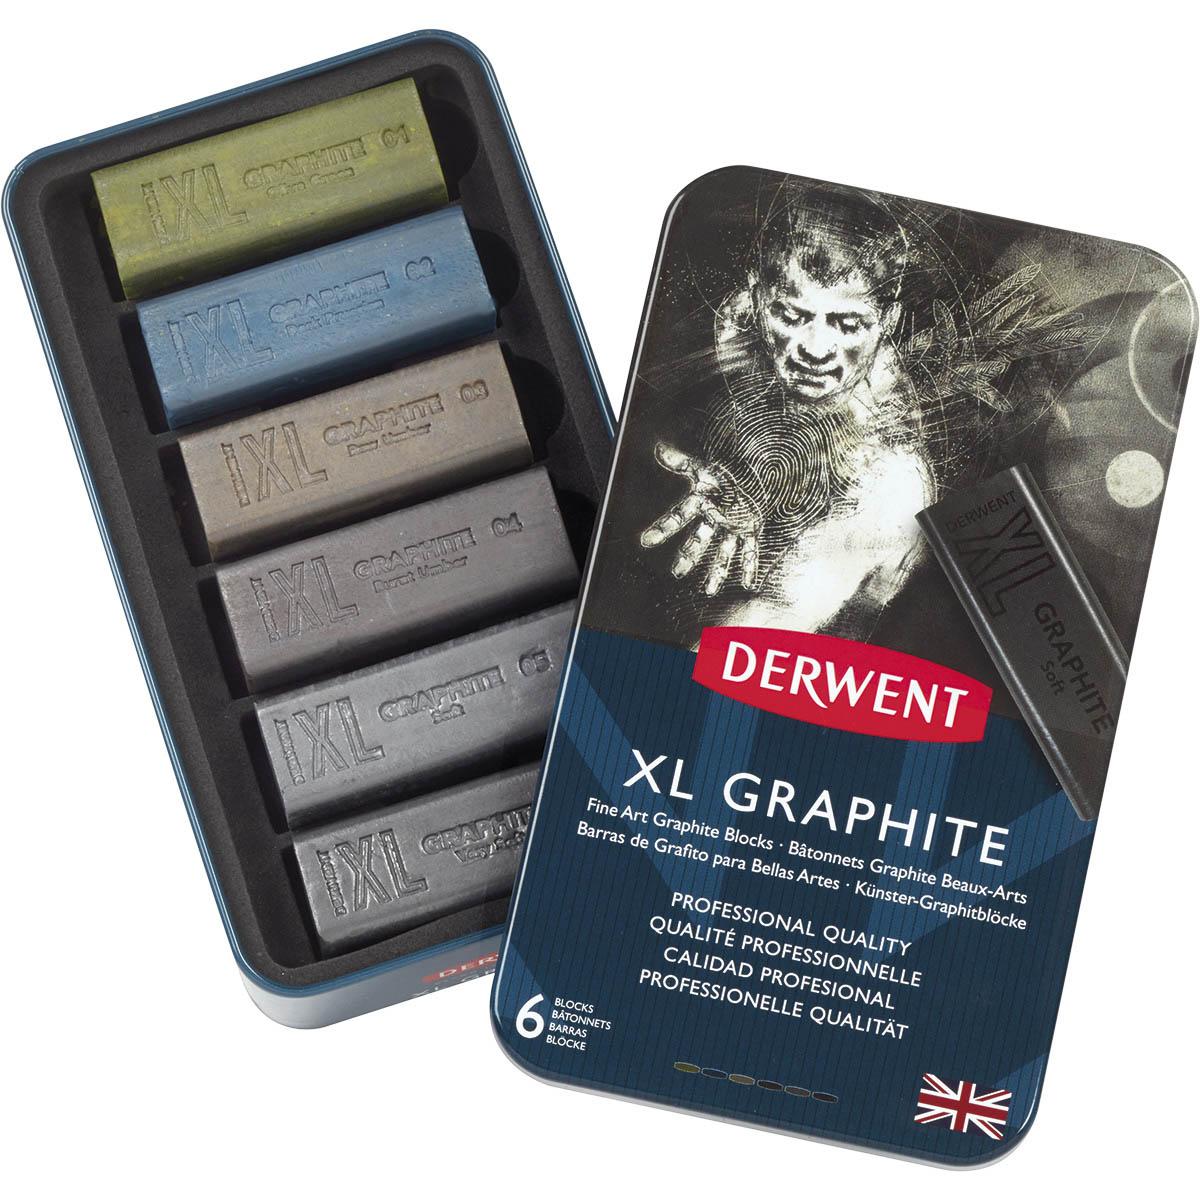 Graphite XL 6 Cores Estojo Lata Derwent